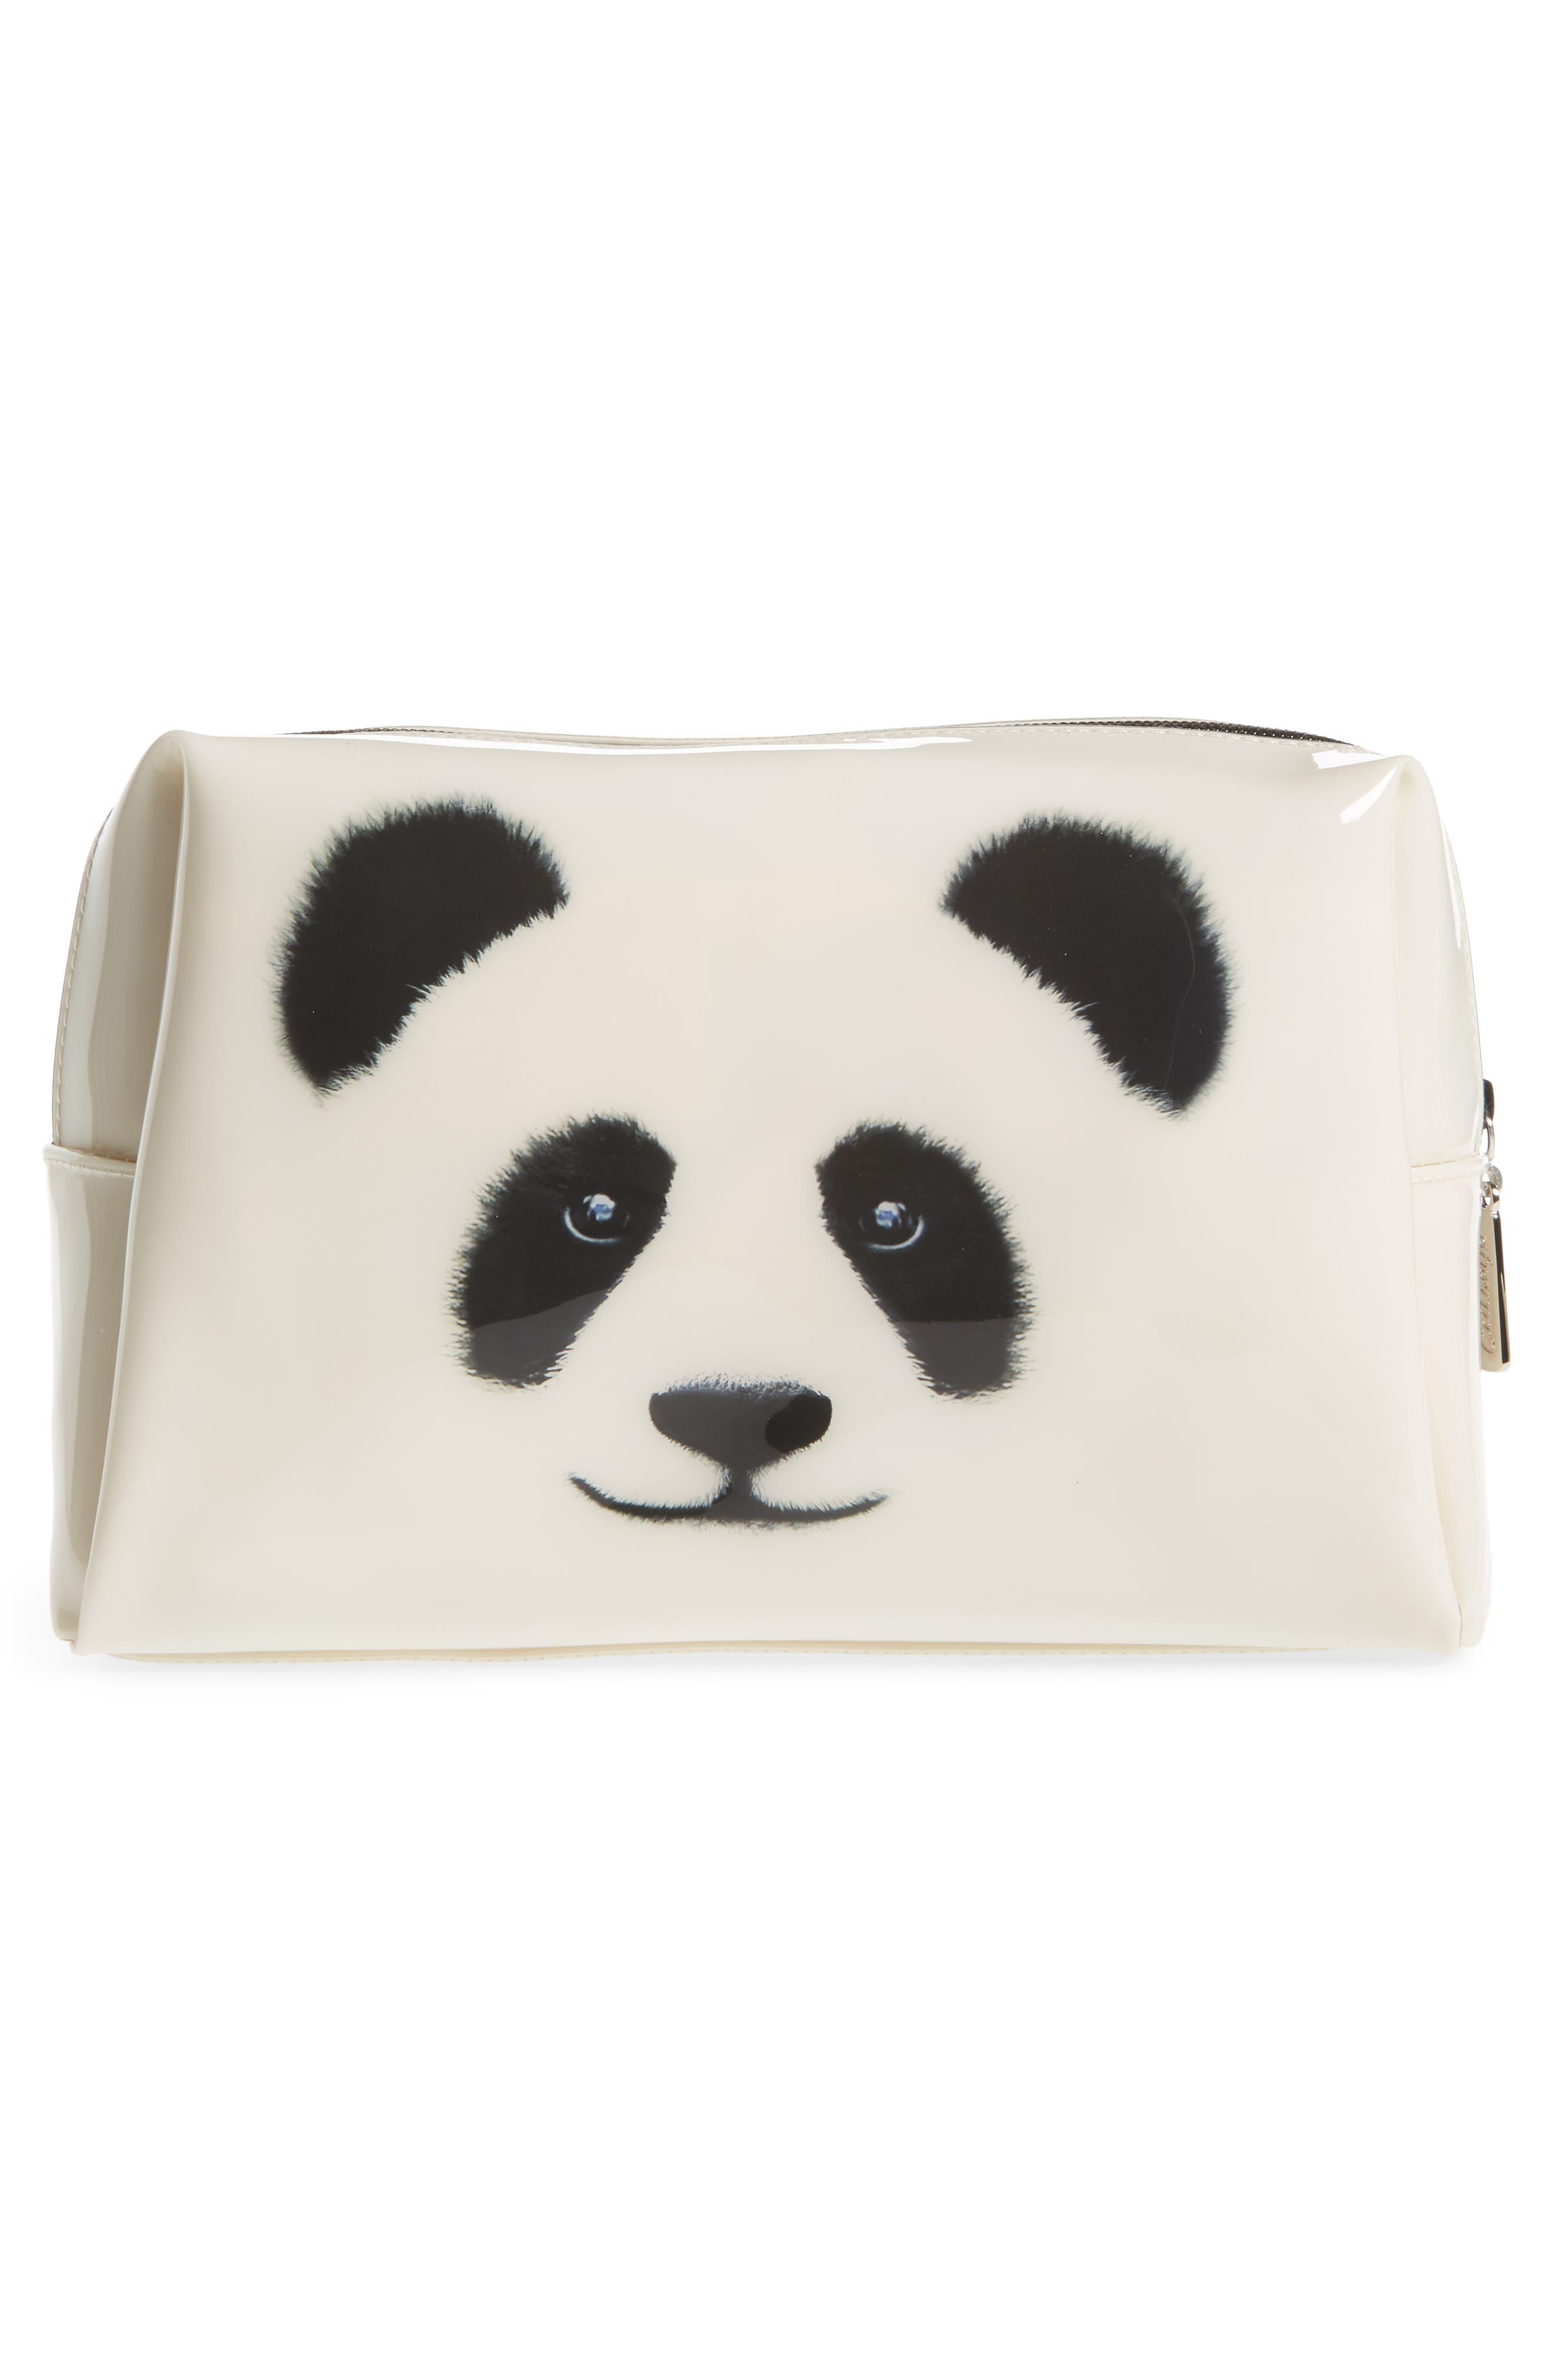 Big Face Panda Large Cosmetics Bag,                             Alternate thumbnail 2, color,                             100